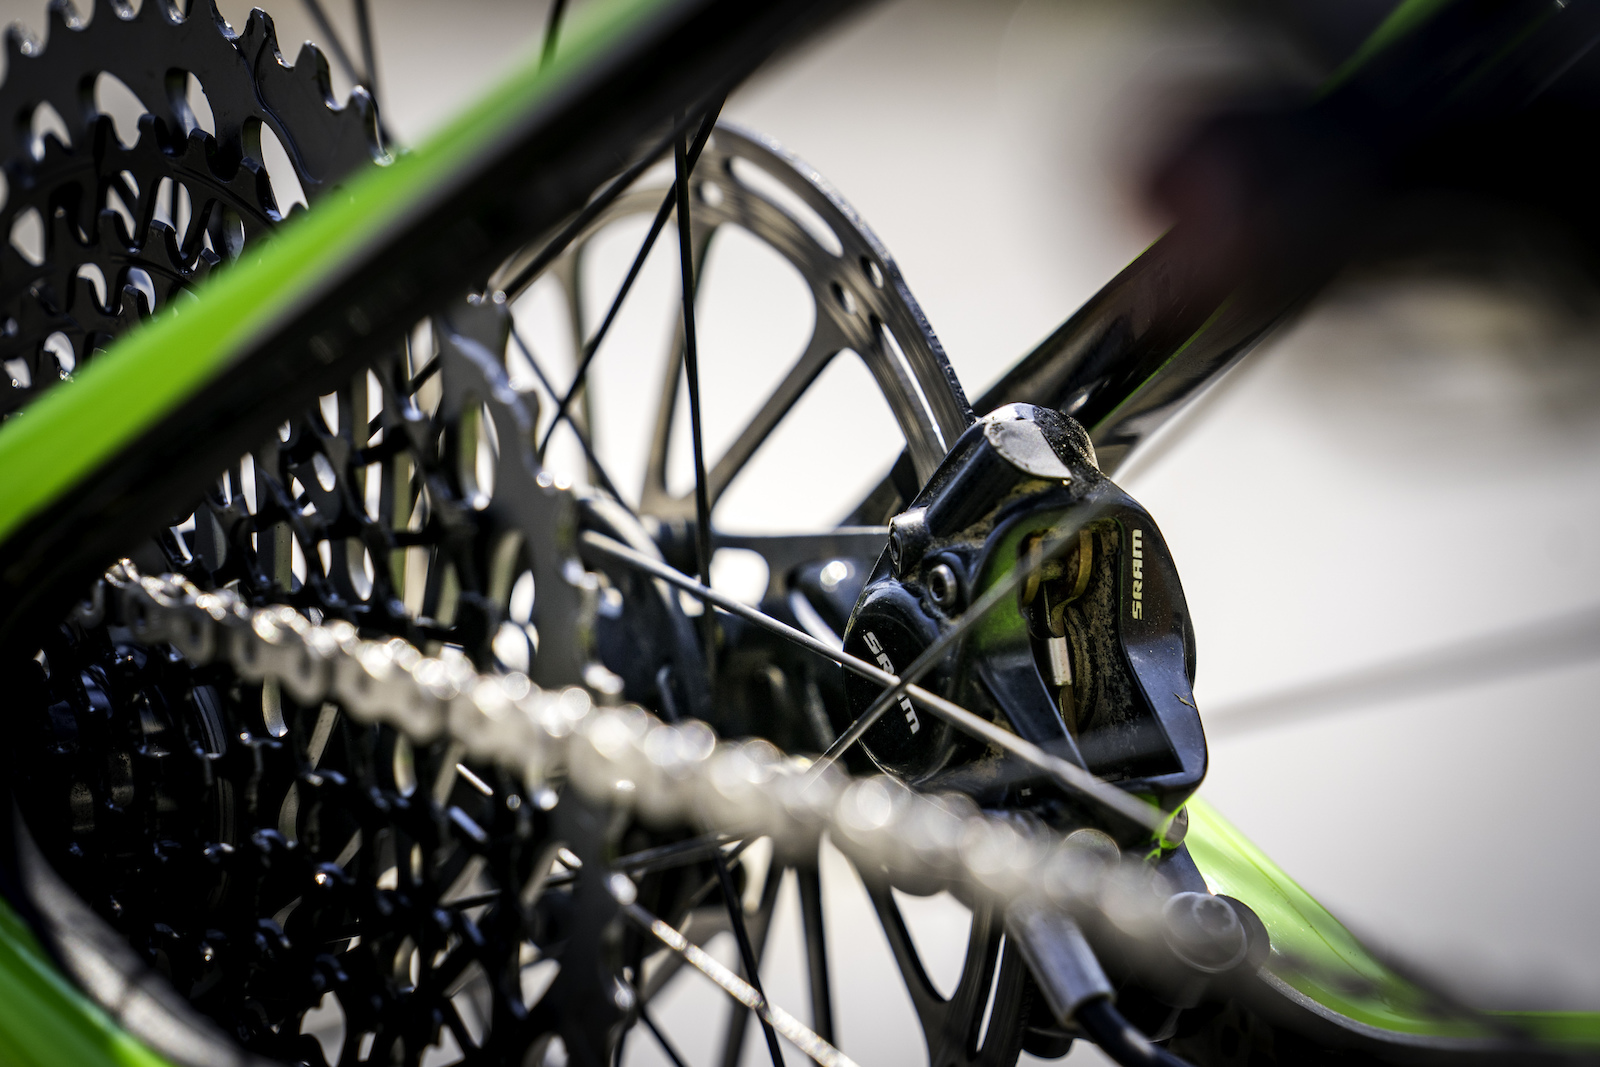 Erin Huck Cannondale Scalpel Si bike check Mont Sainte Anne